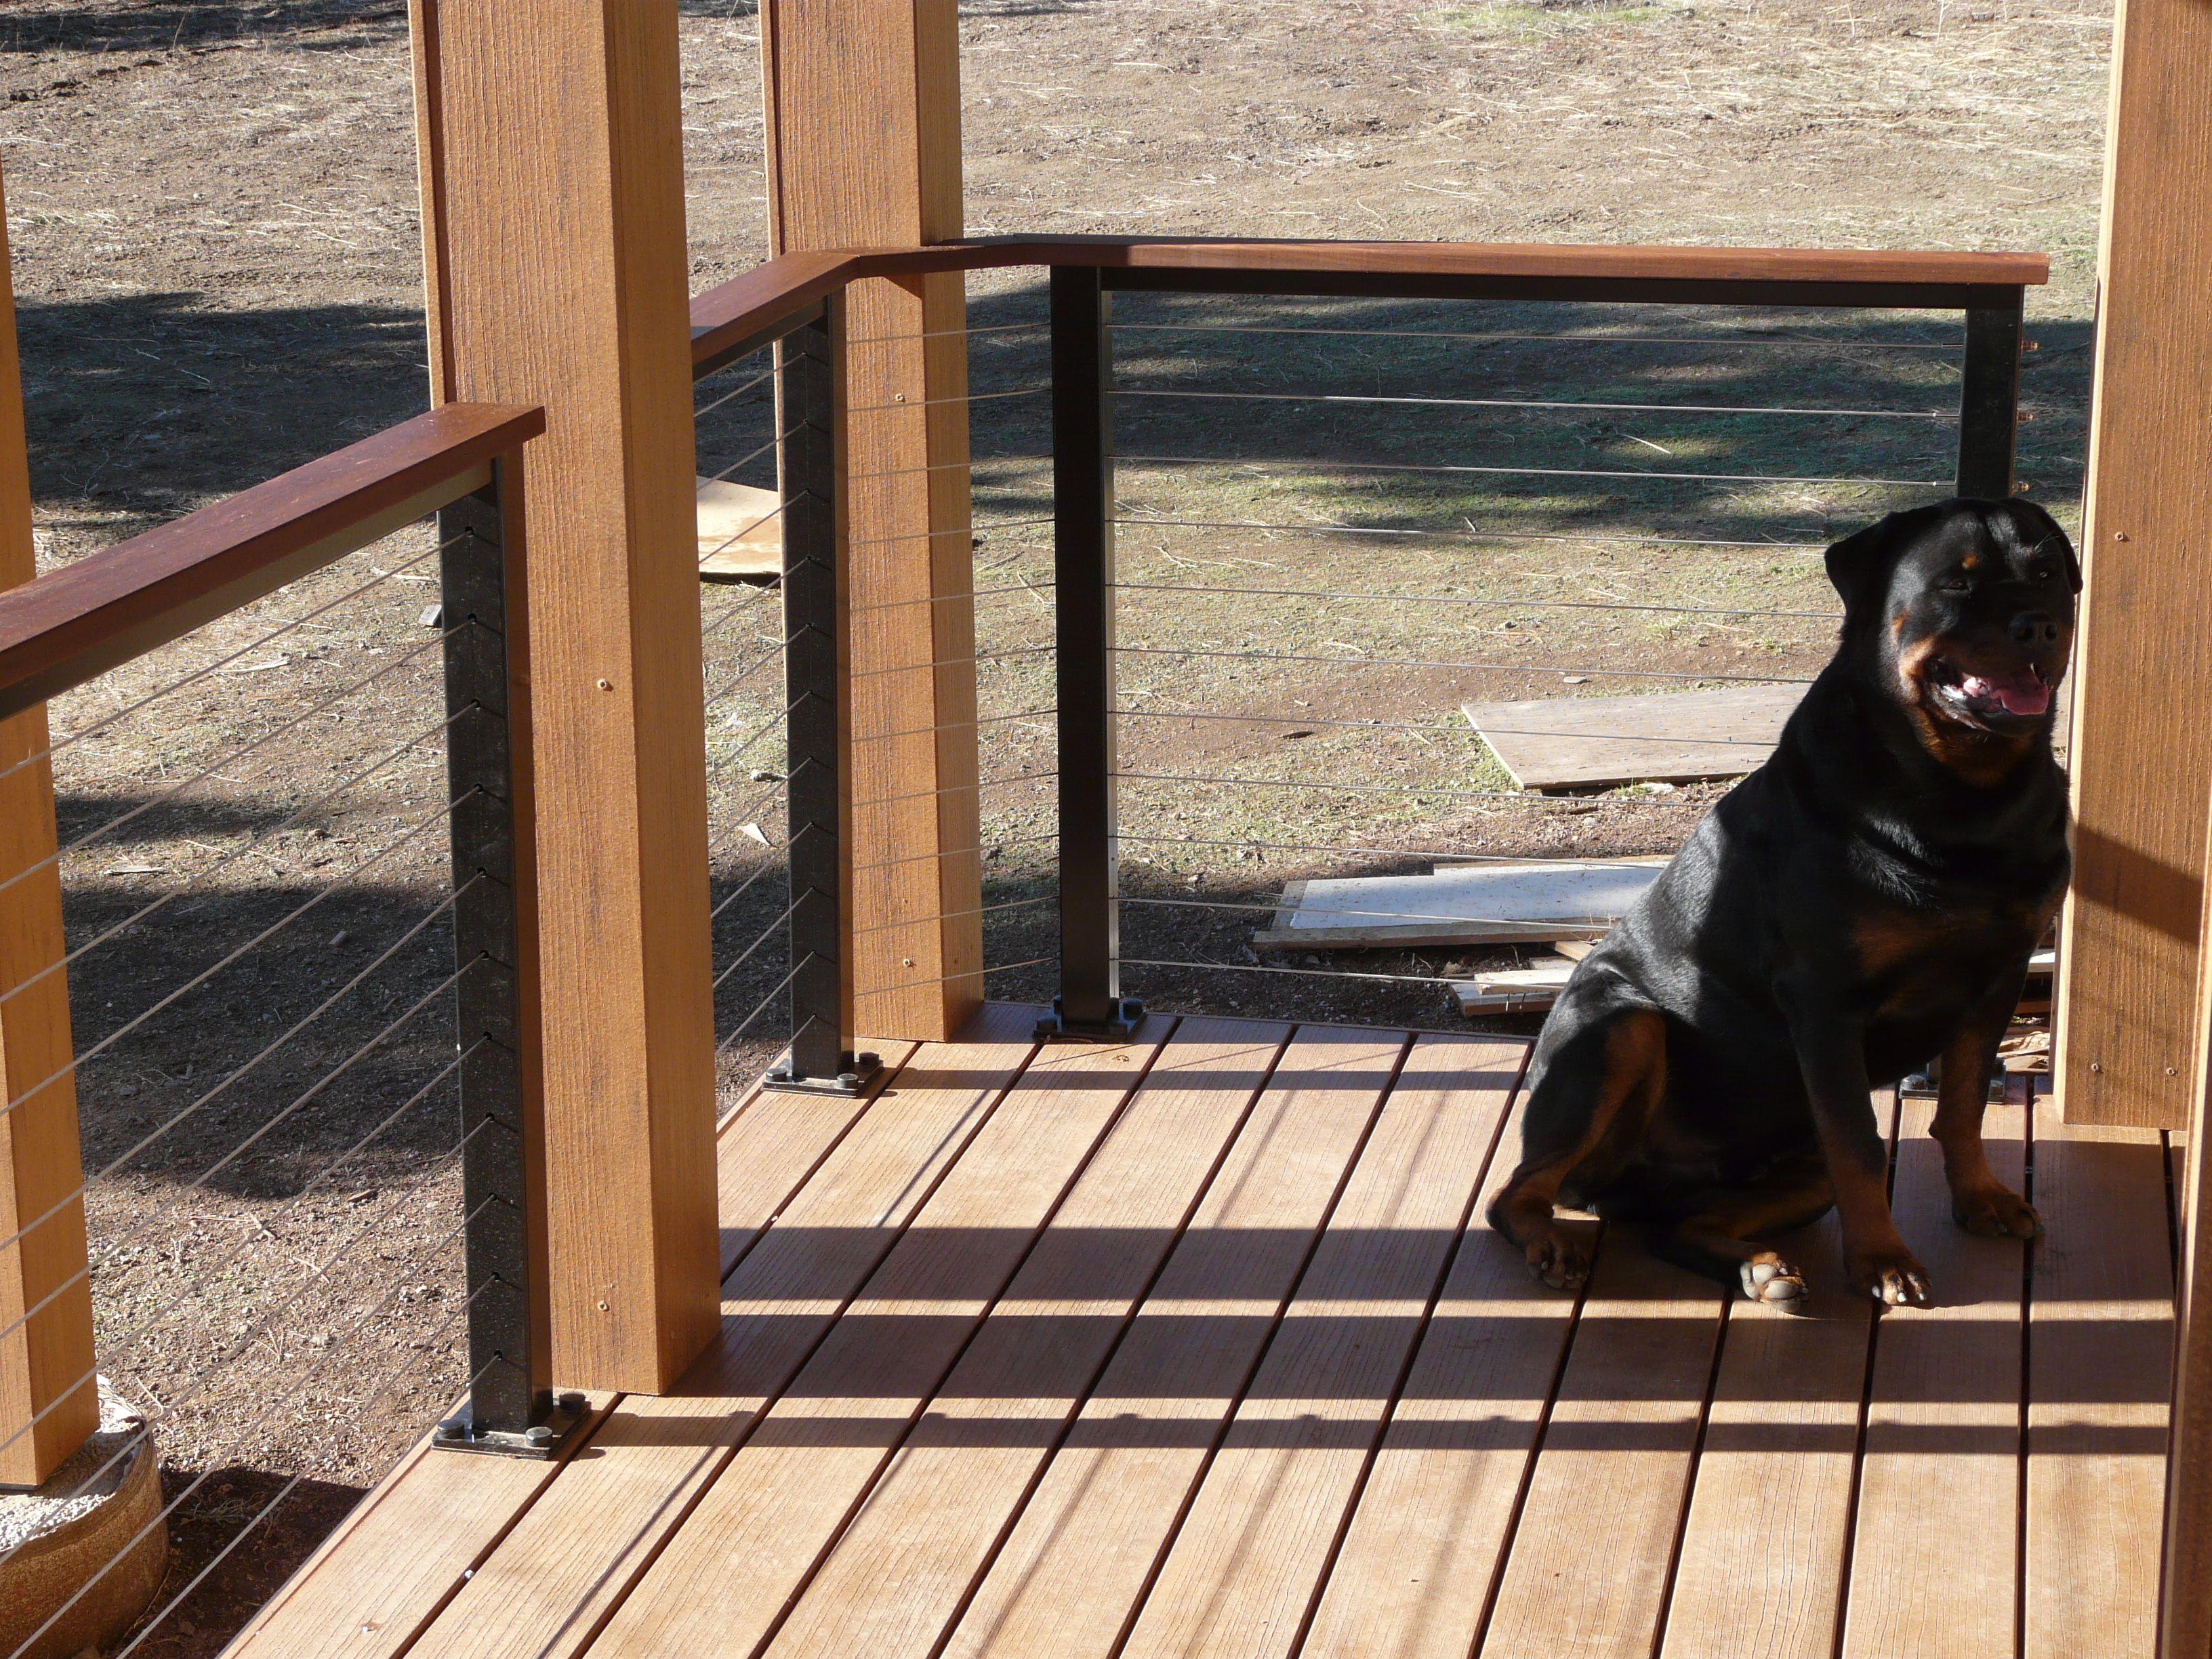 Deck Railing Ideas  Deck Railing Ideas: Black Aluminum Posts With Wood Top  Rail And